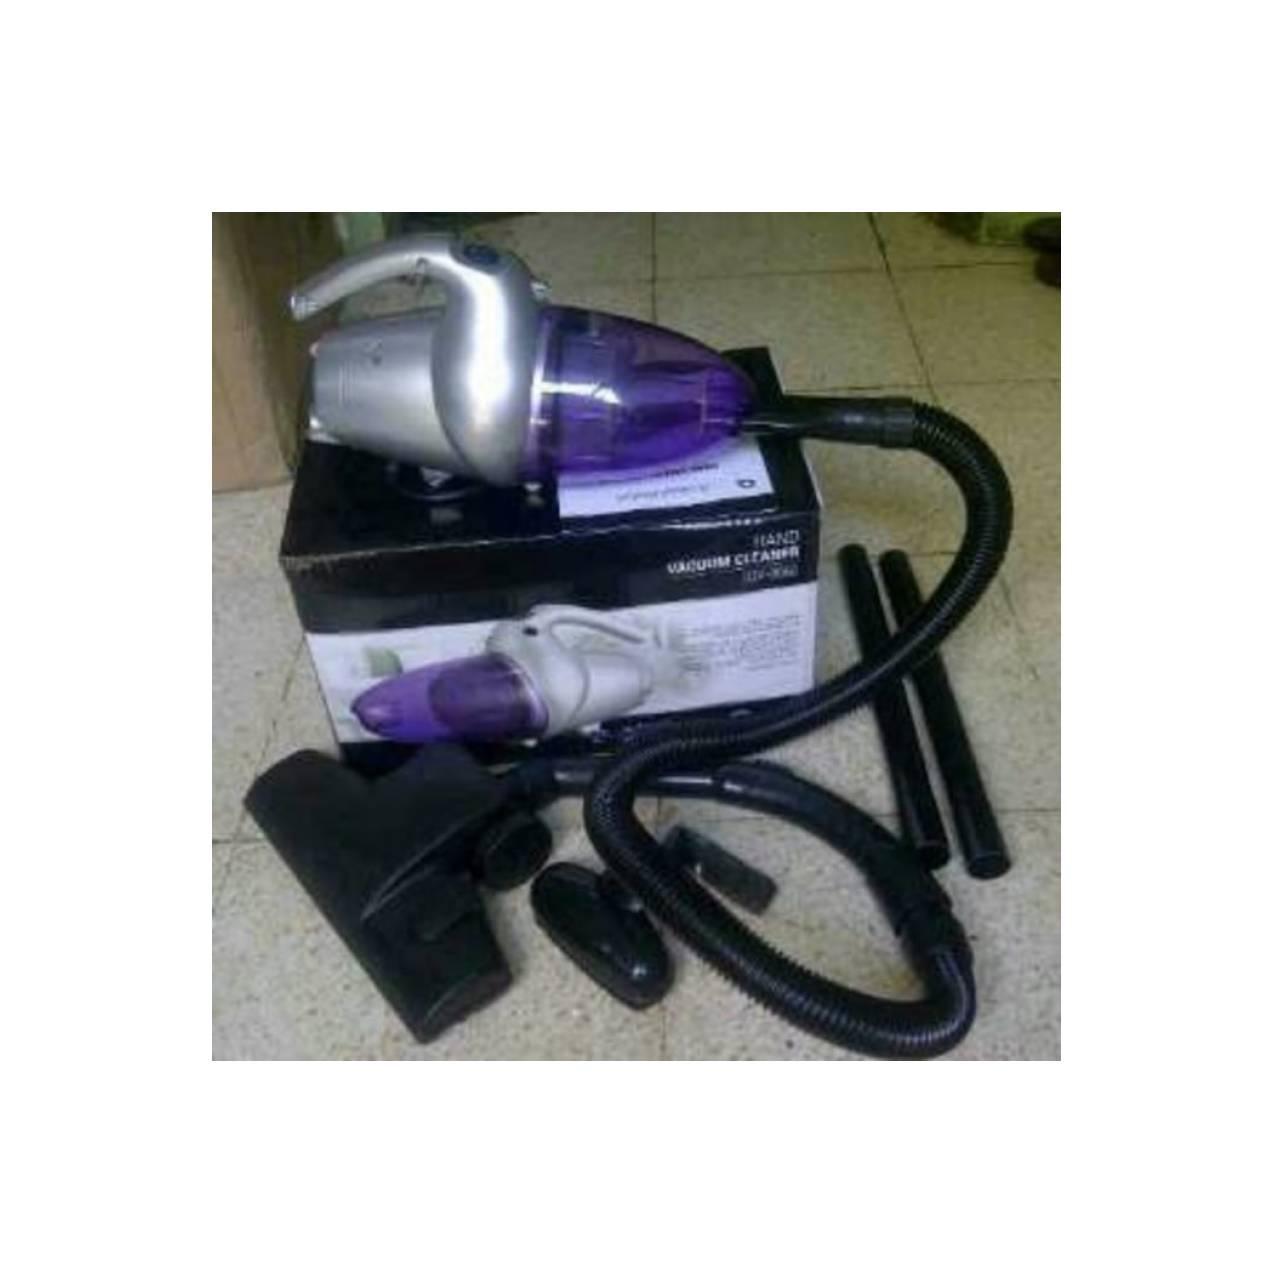 Vacum Cleaner Oxone OX 866 | OX866 Oxone Blower & Hand Vacuum Cleaner